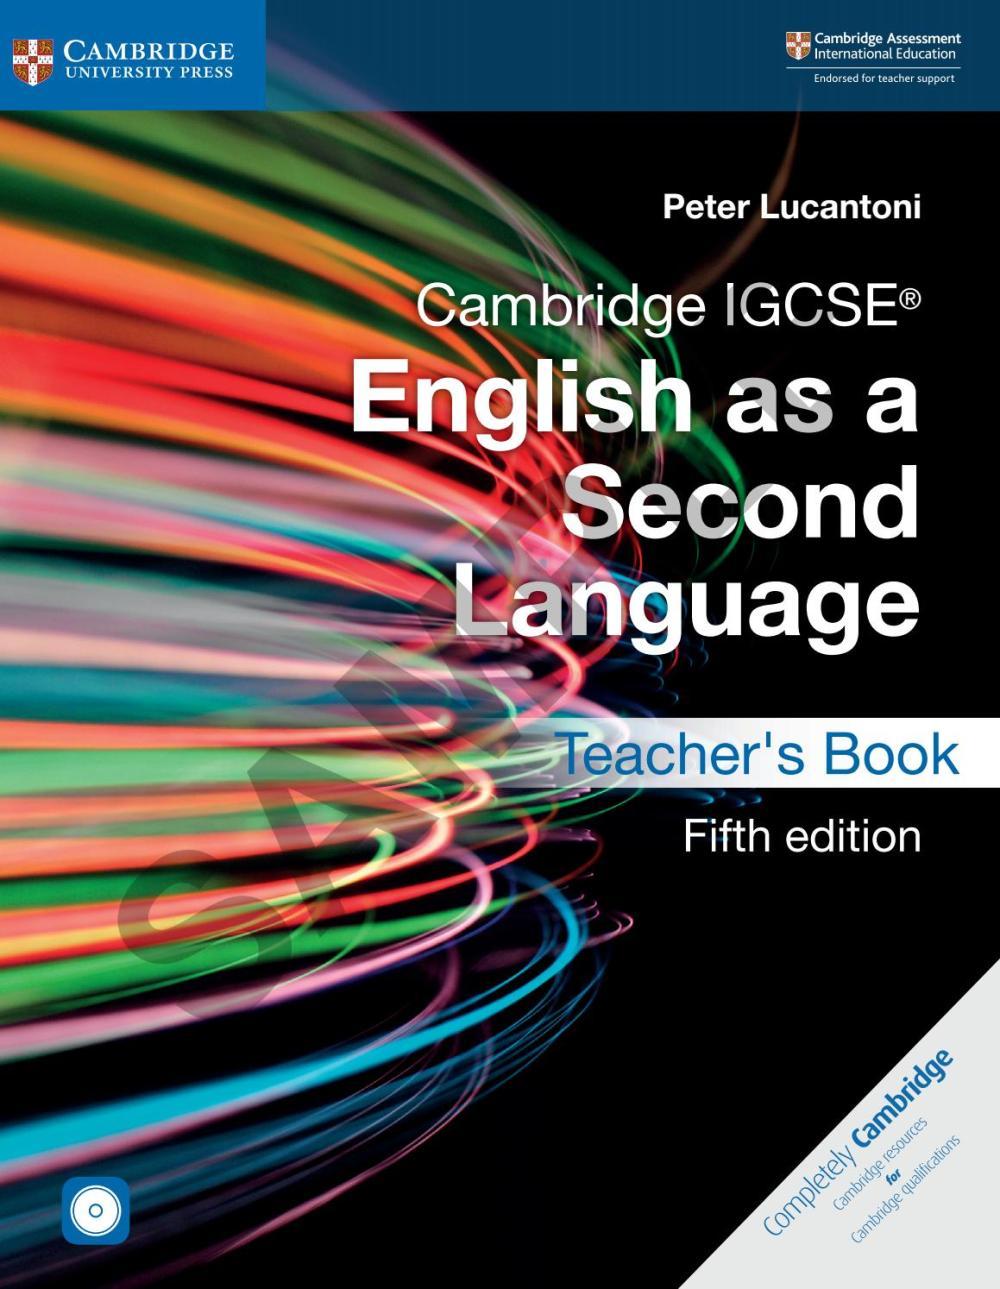 medium resolution of Cambridge IGCSE English as a Second Language Teacher's Resources by  Cambridge University Press Education - issuu